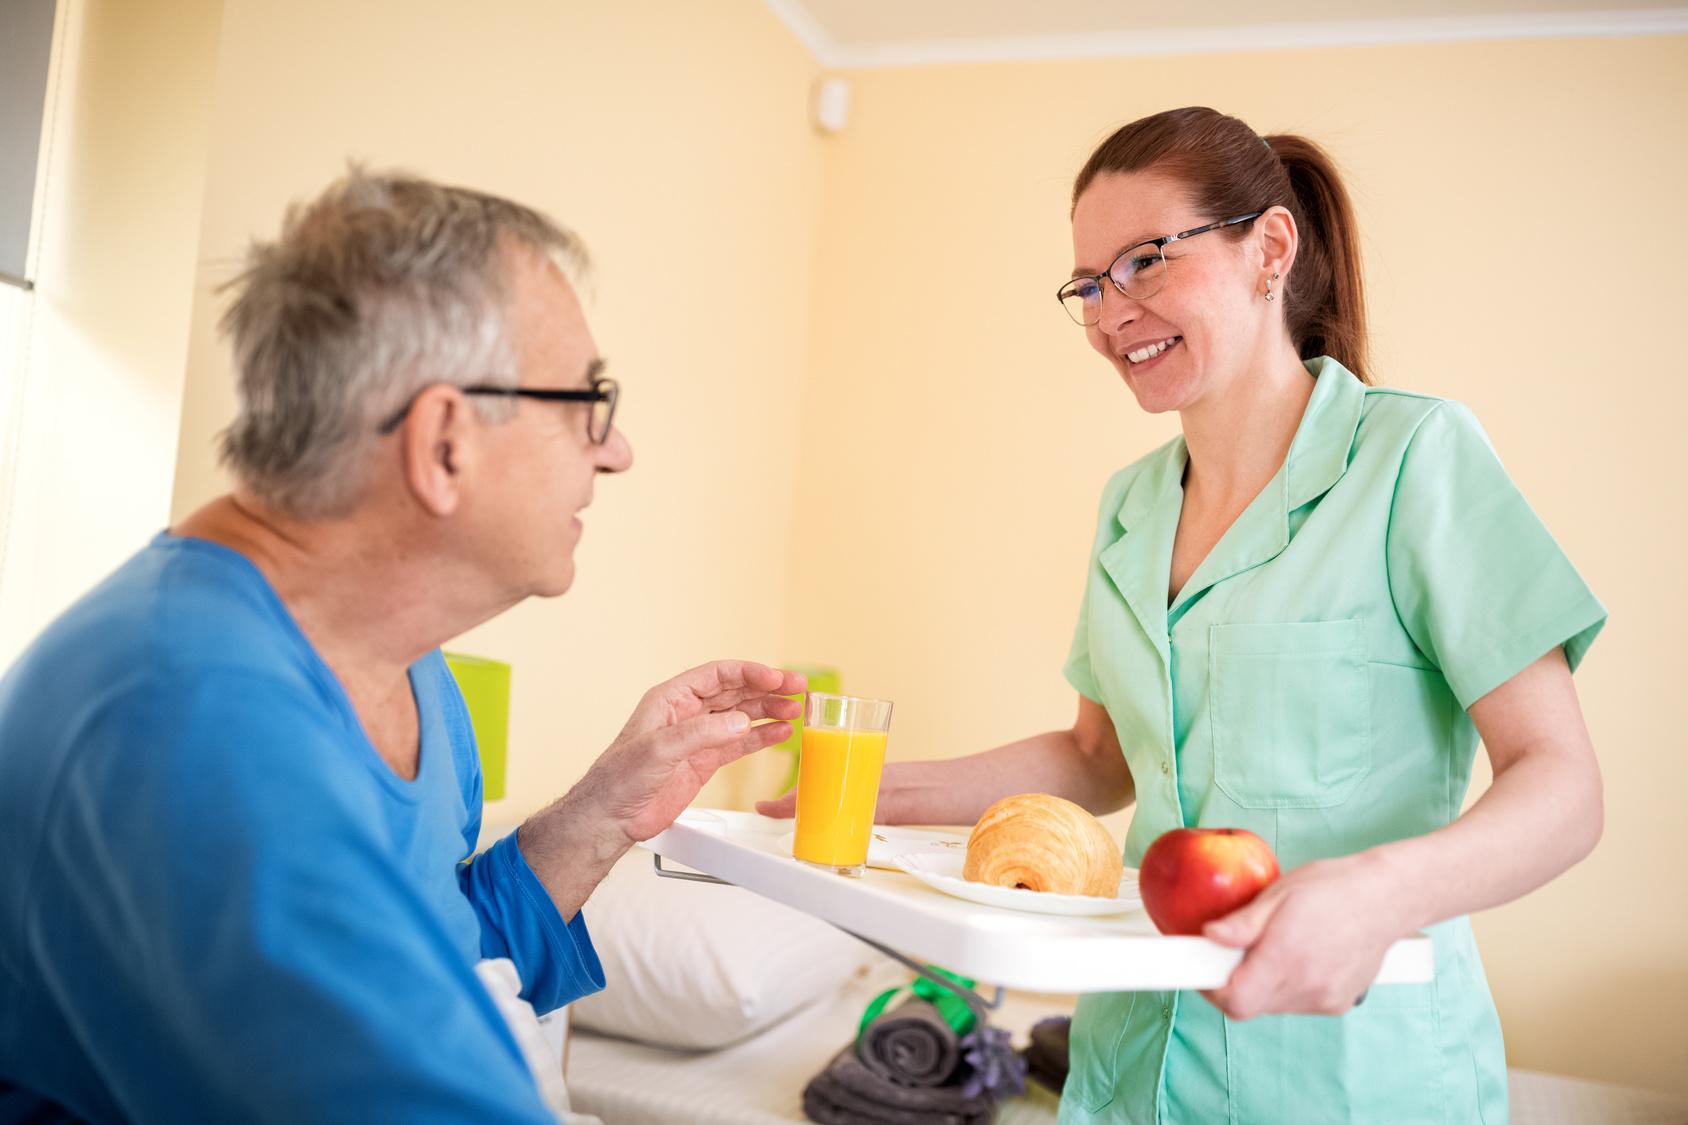 Caregiver-Meal-Preparation-Senior